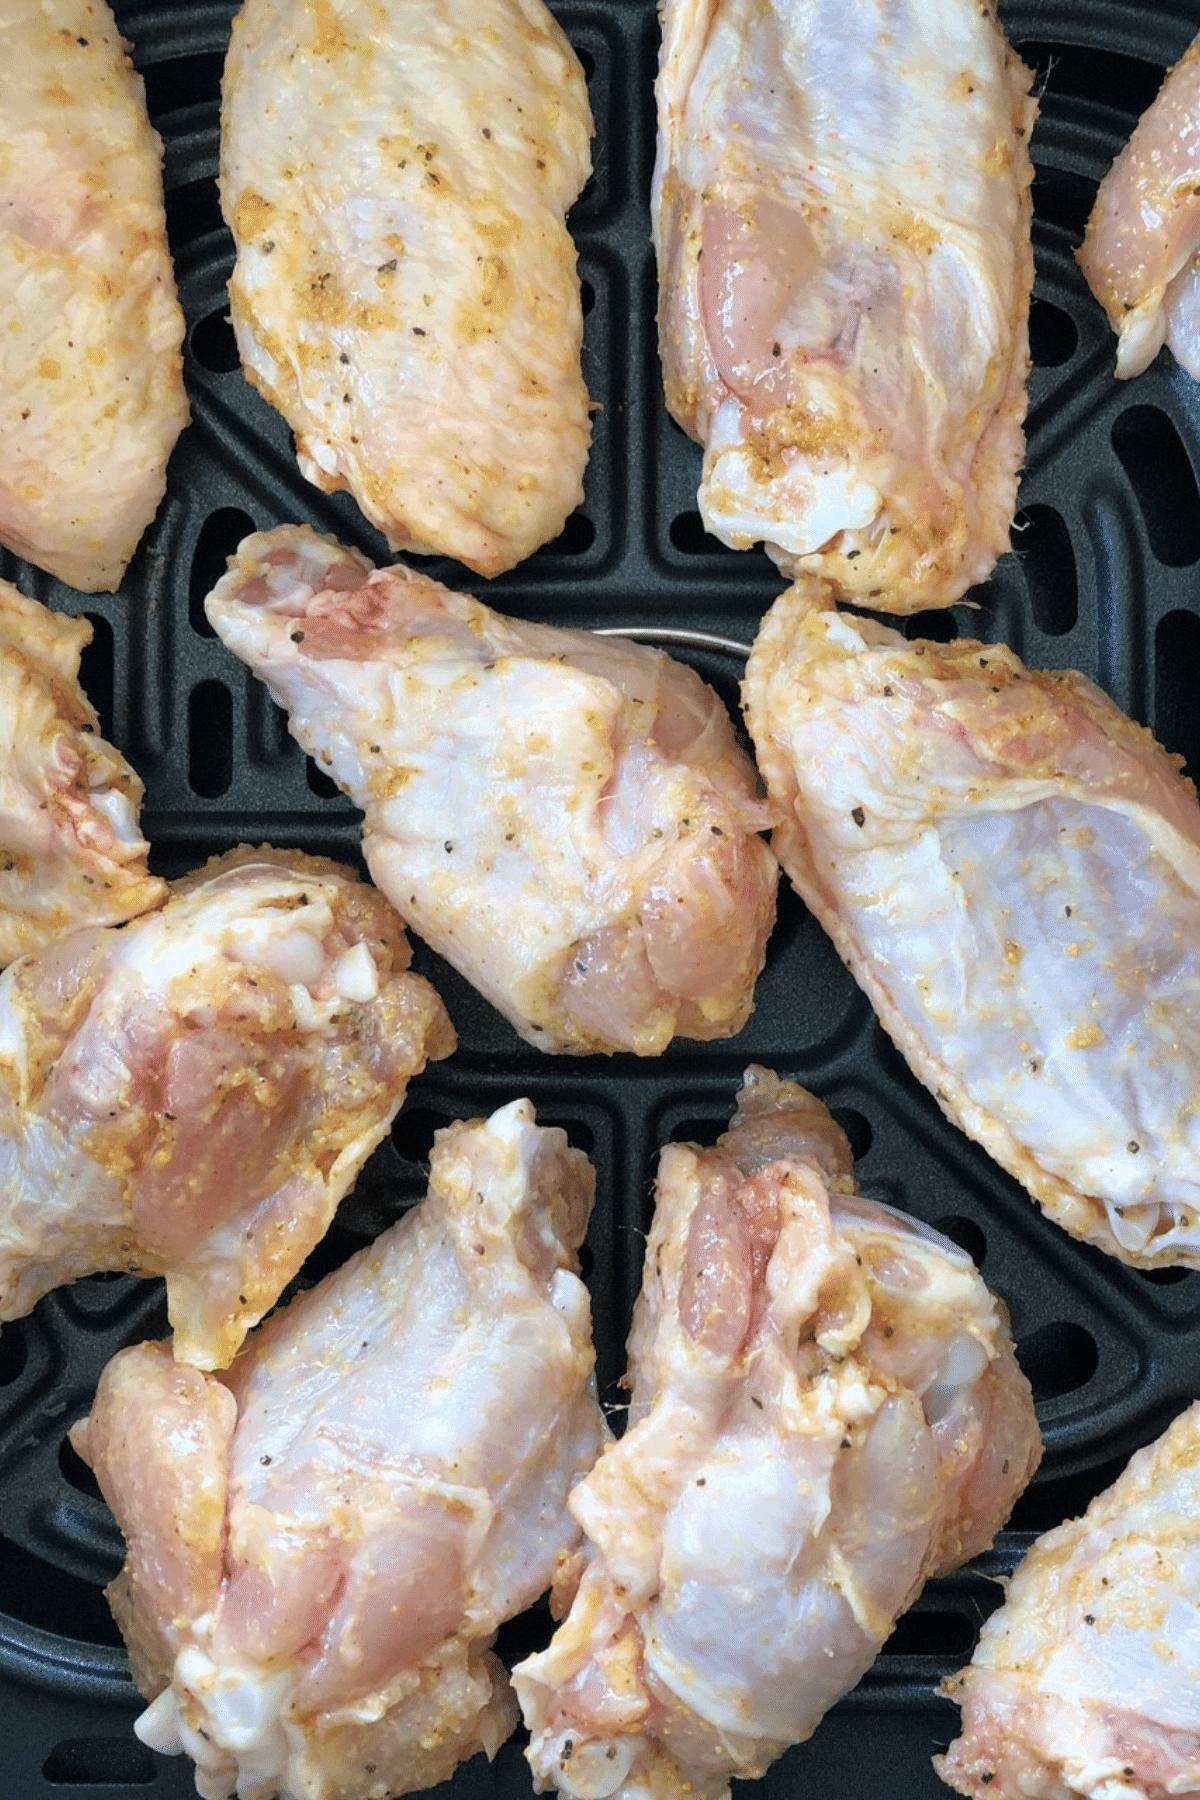 Seasoned chicken wings place in air fryer basket